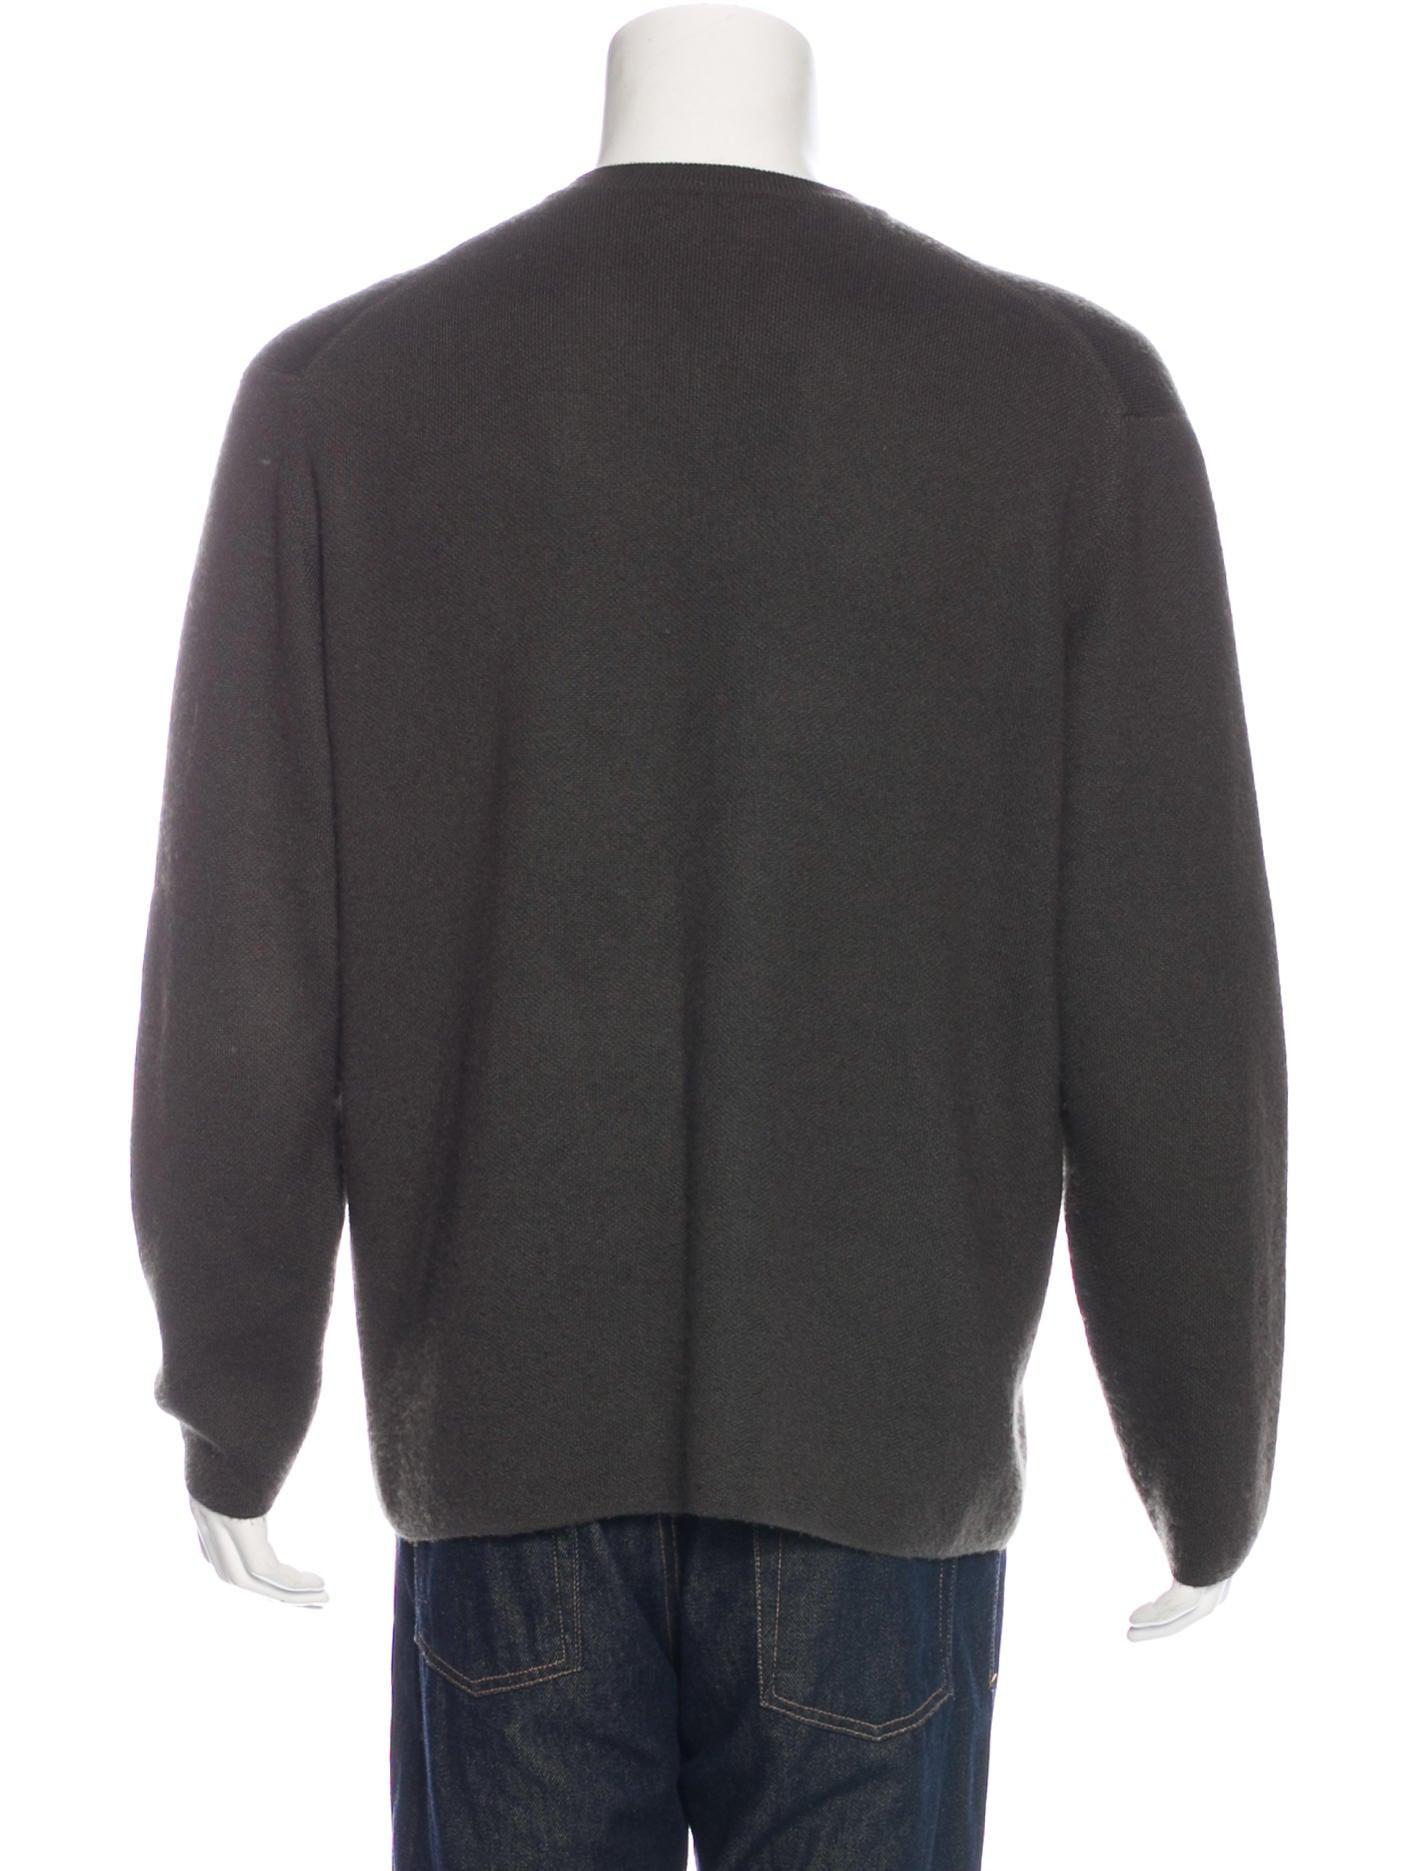 Shop online for Men's Cashmere Sweaters: Crewneck & V-Neck at fatalovely.cf Find turtlenecks & cardigans. Free Shipping. Free Returns. All the time.